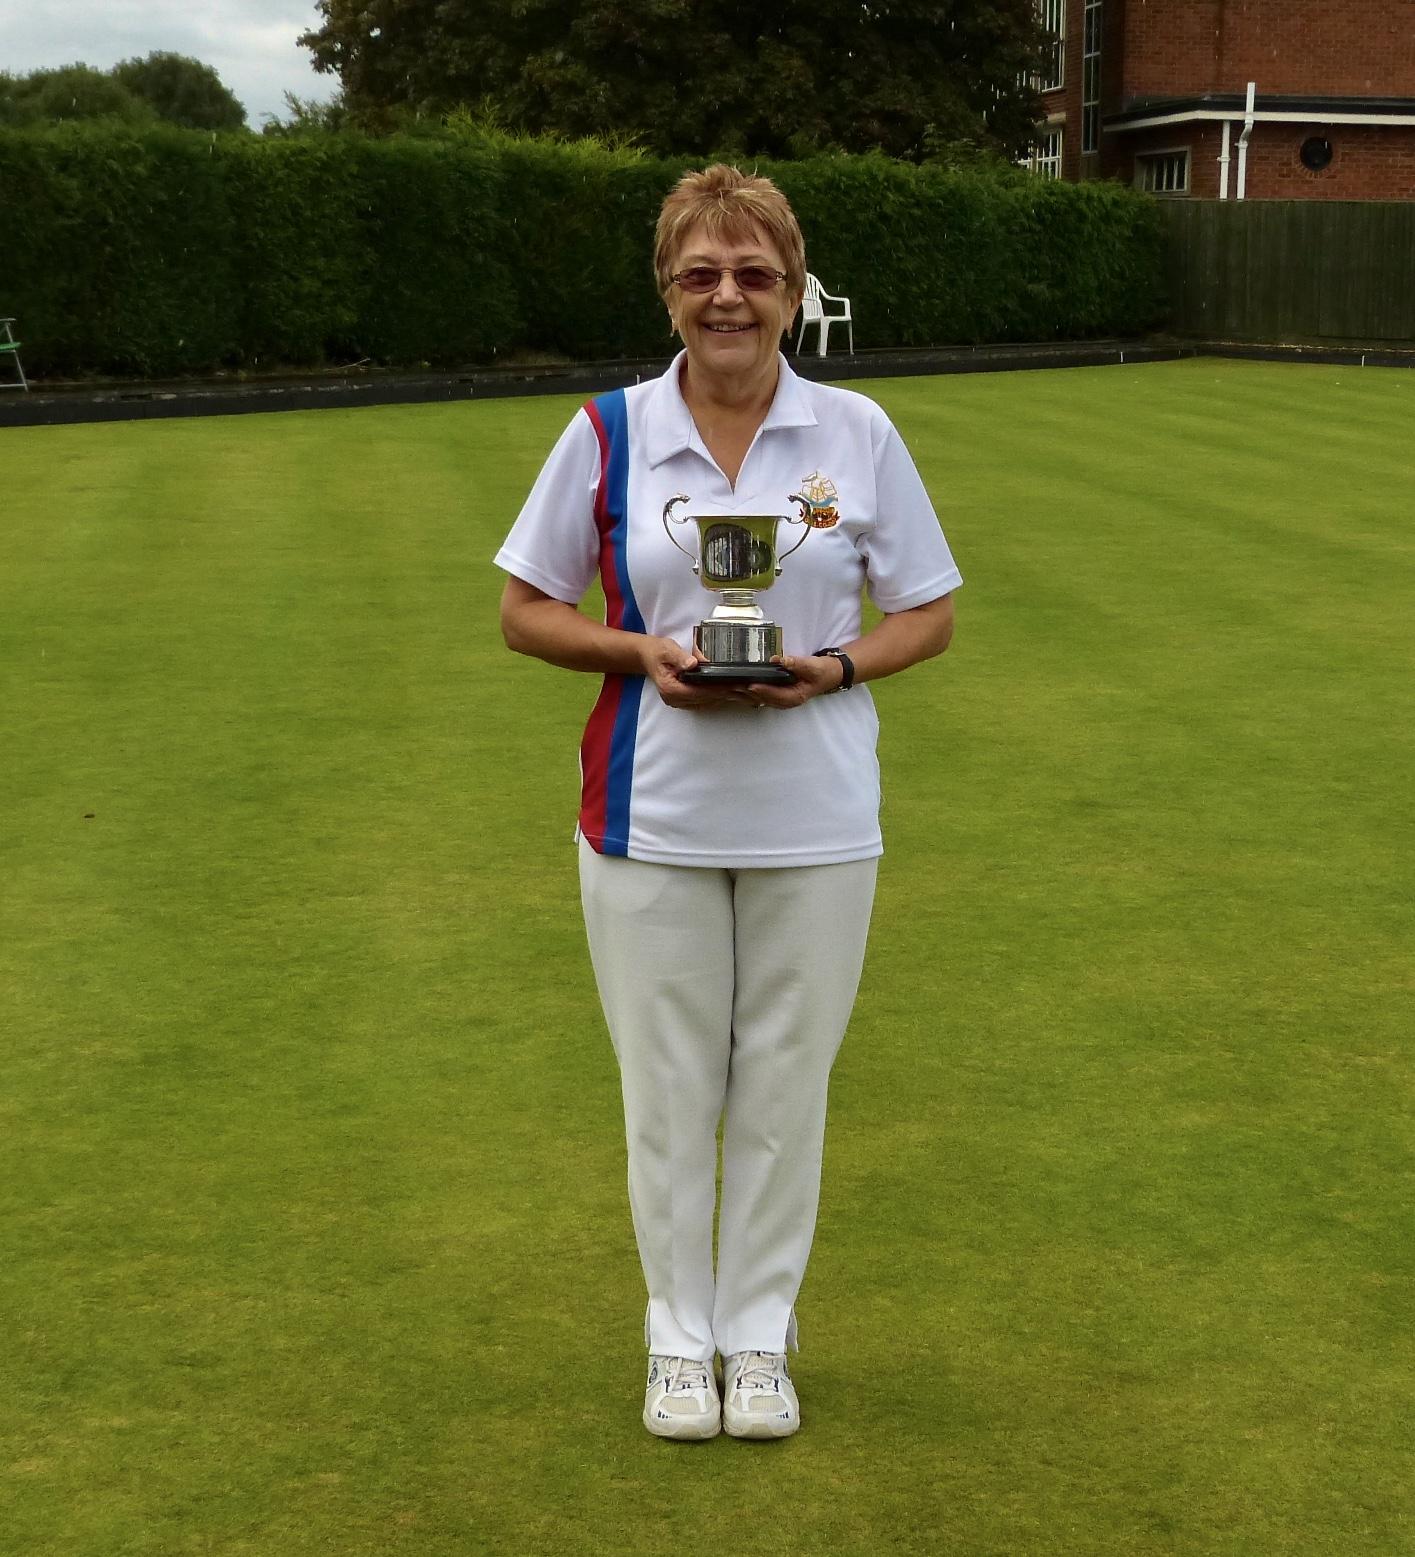 LADES 2 WOOD   Winner - Hazel Hembling  Runner Up - Margaret Young